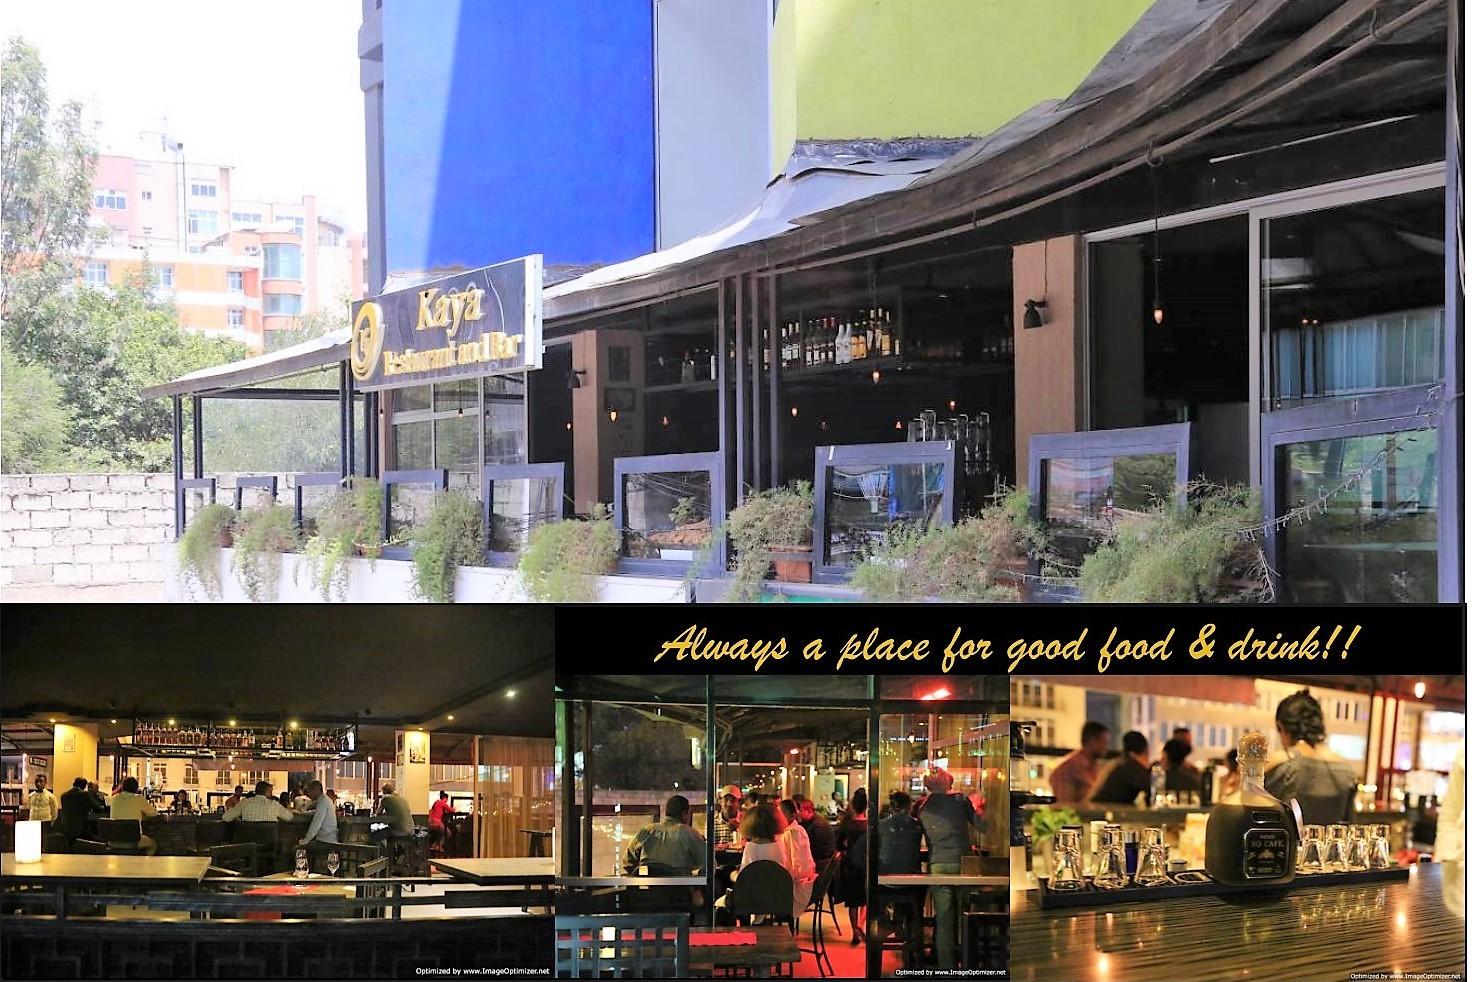 Kaya Restaurant & Bar! Always a place for good food & drink